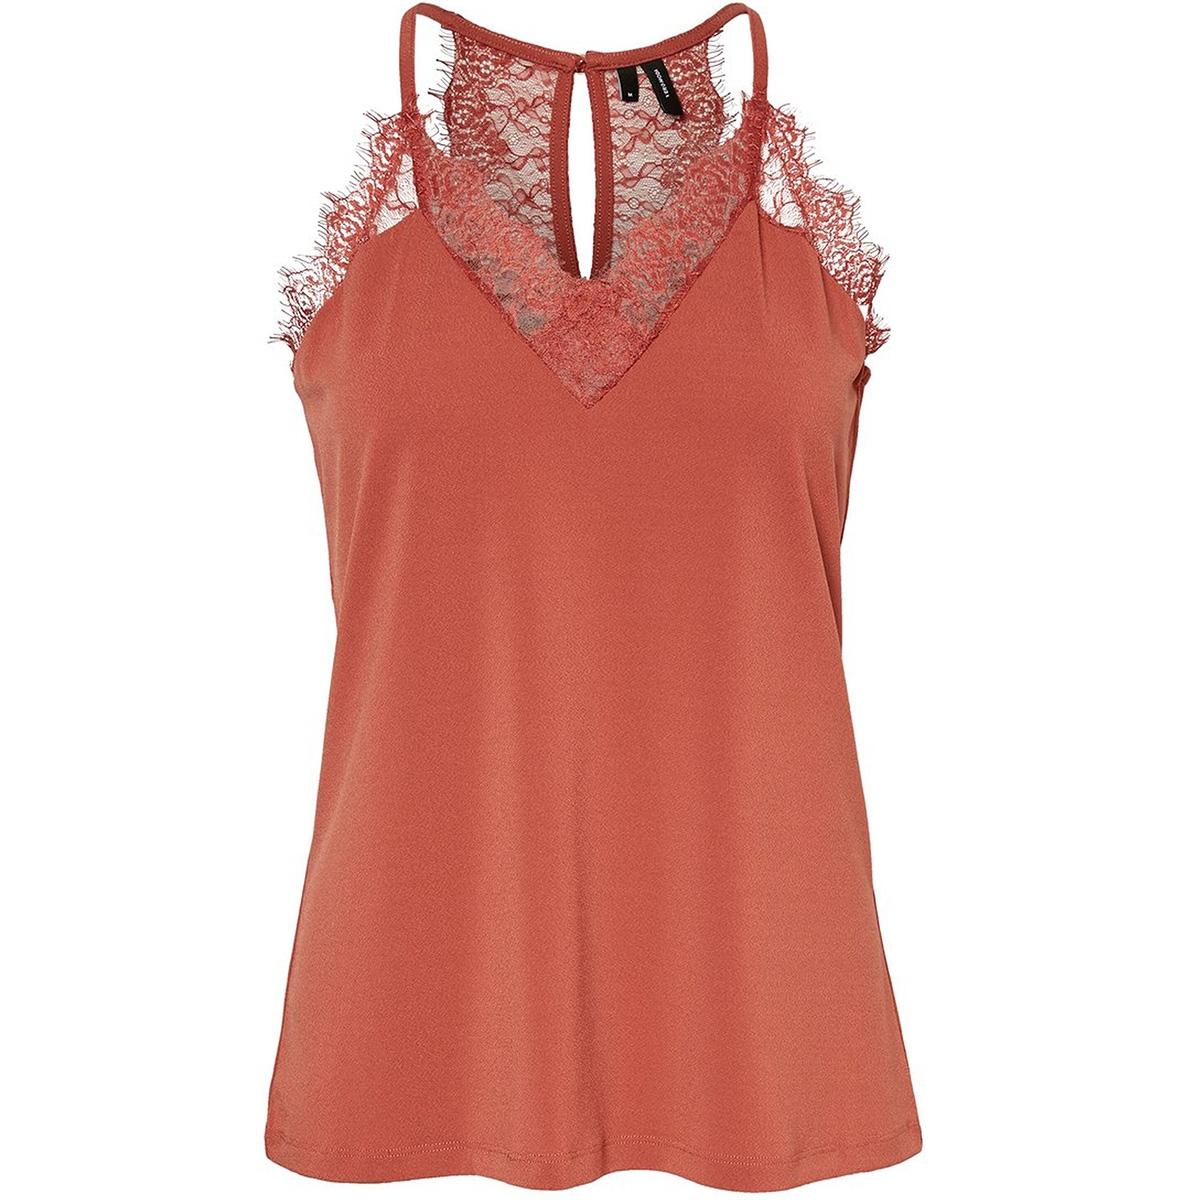 vmmilla s/l lace top color 10209420 vero moda top marsala